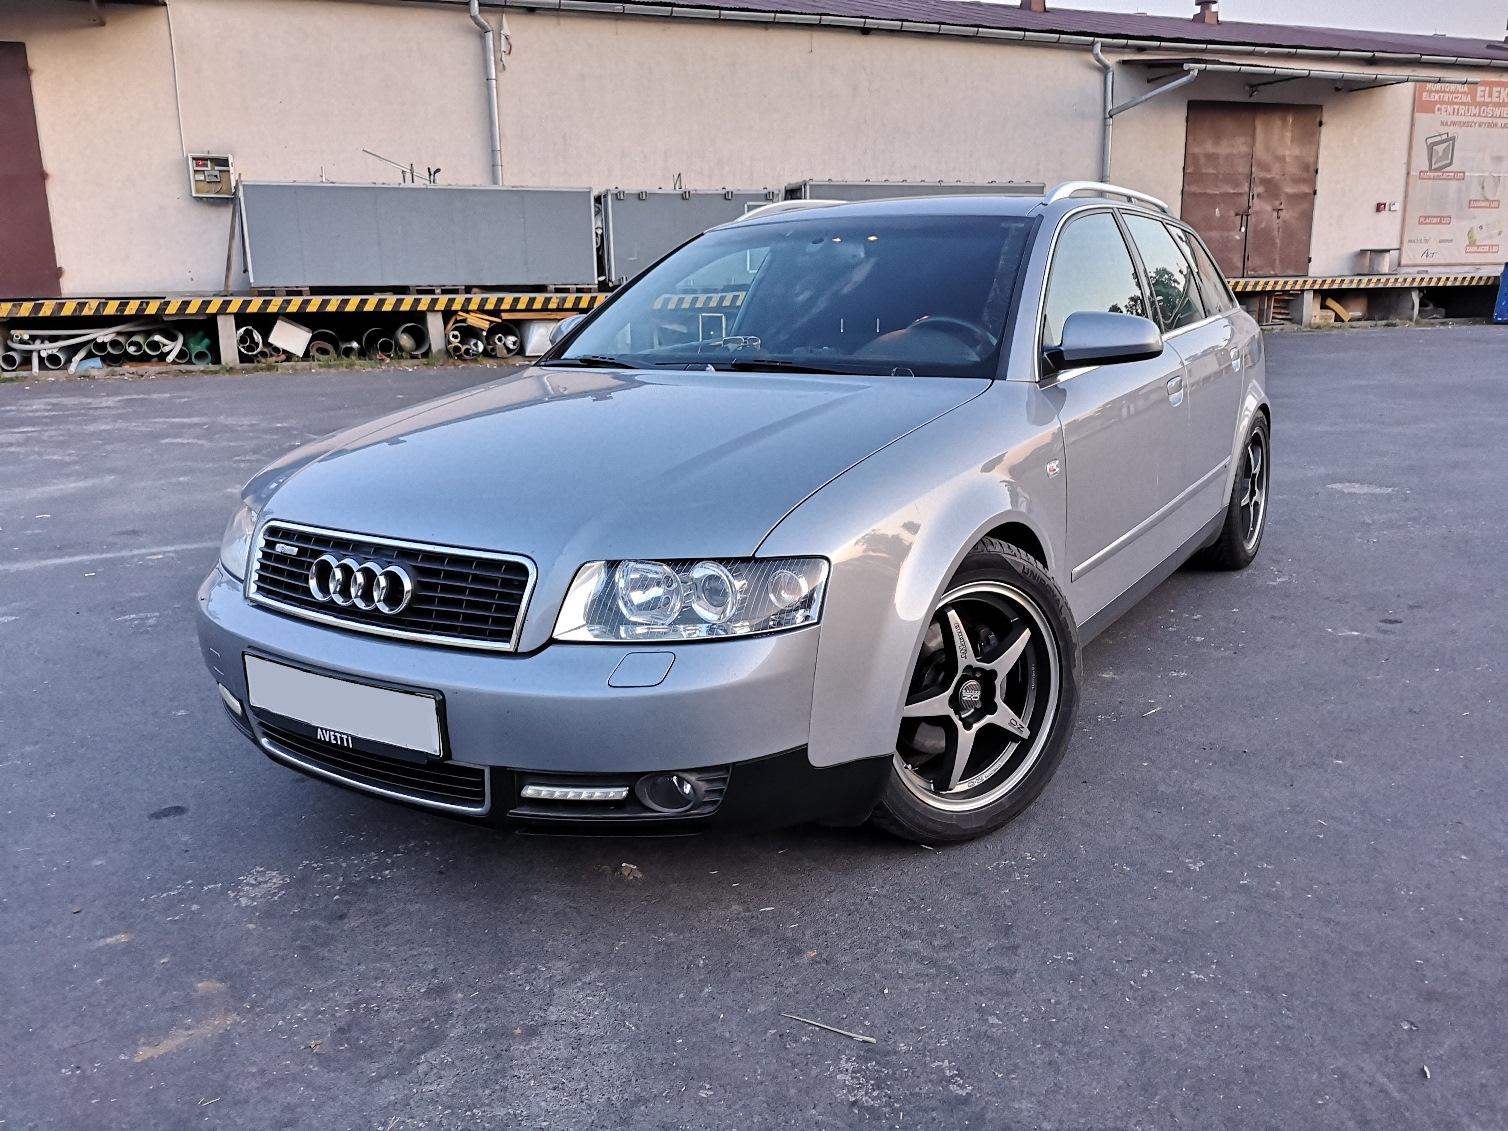 Audi A4 B6 1.9TDI 131KM >> 169KM 383Nm